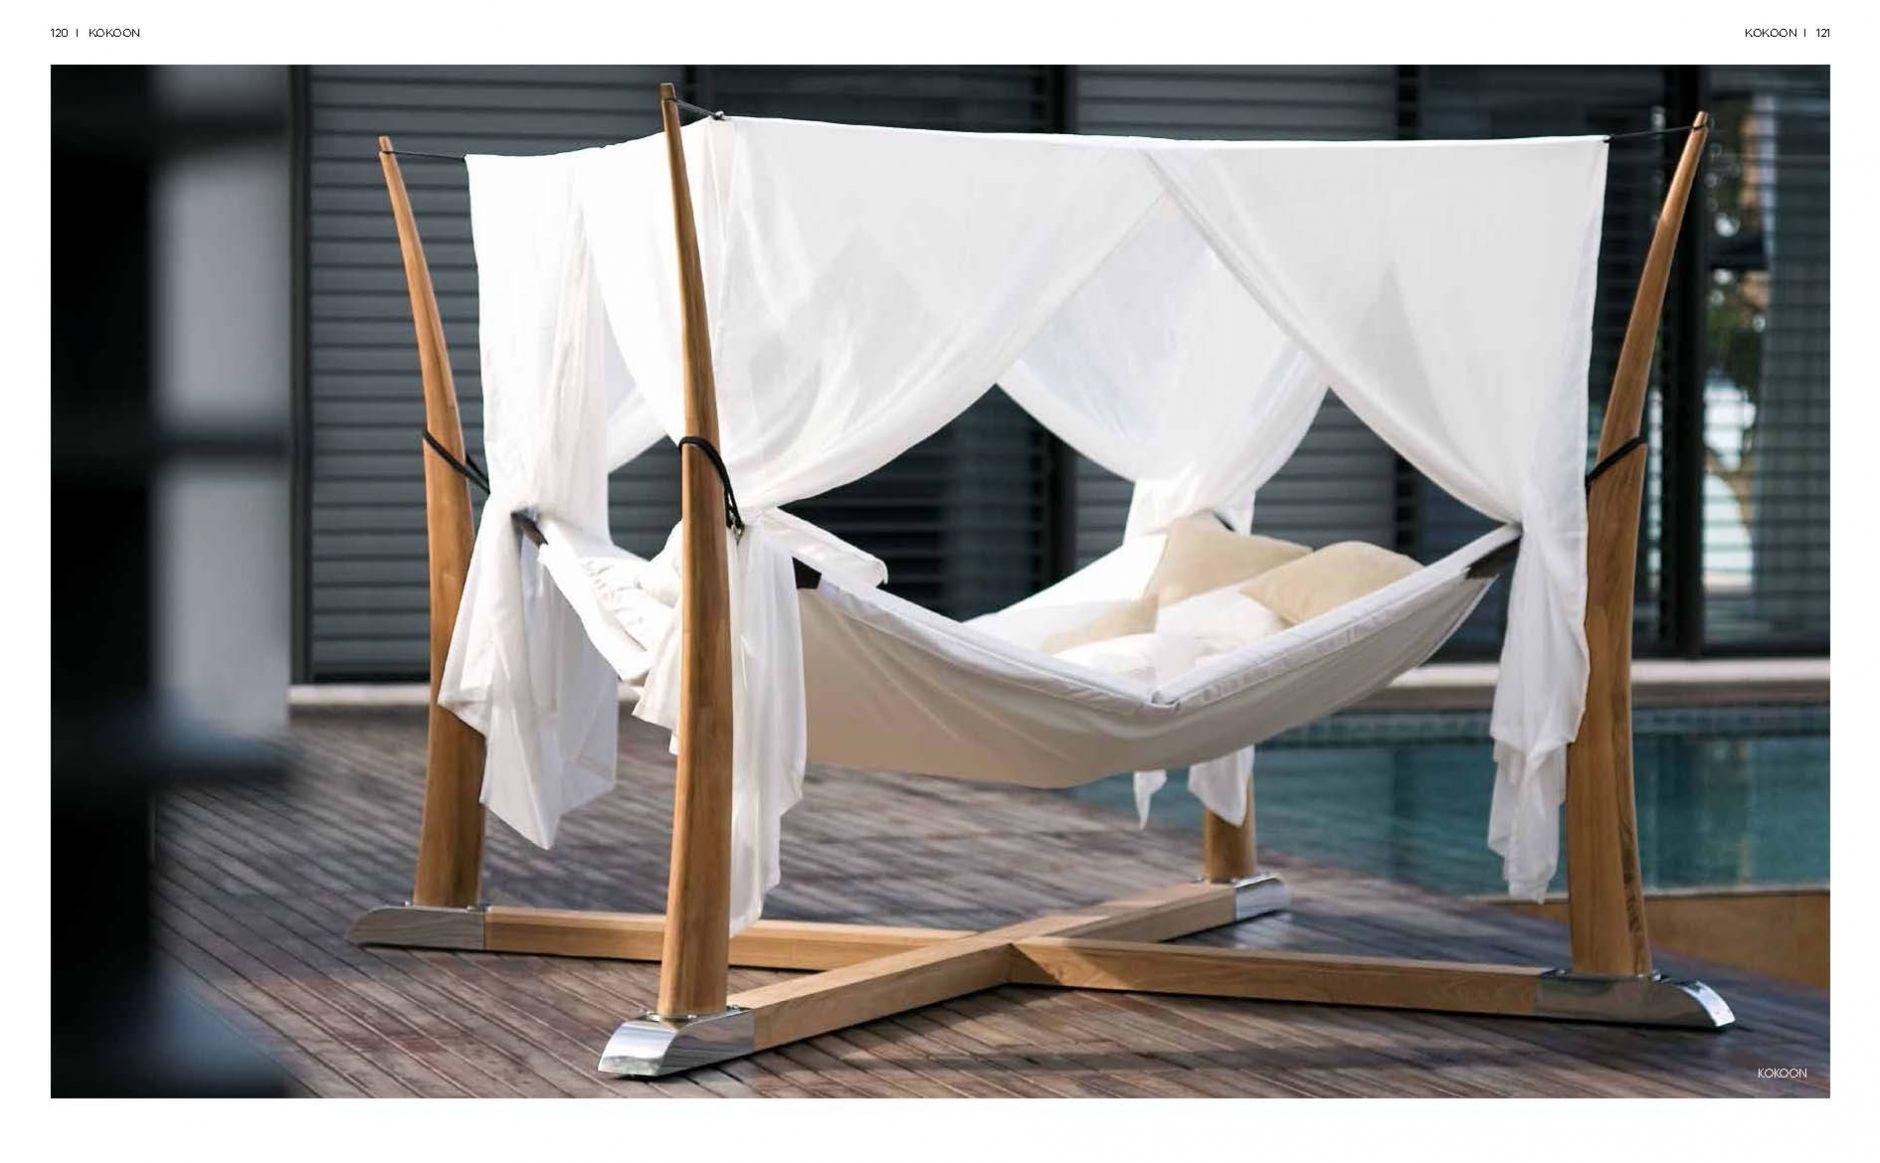 lits de plage lit hamac rb kokoonles meubles de l 39 italie. Black Bedroom Furniture Sets. Home Design Ideas